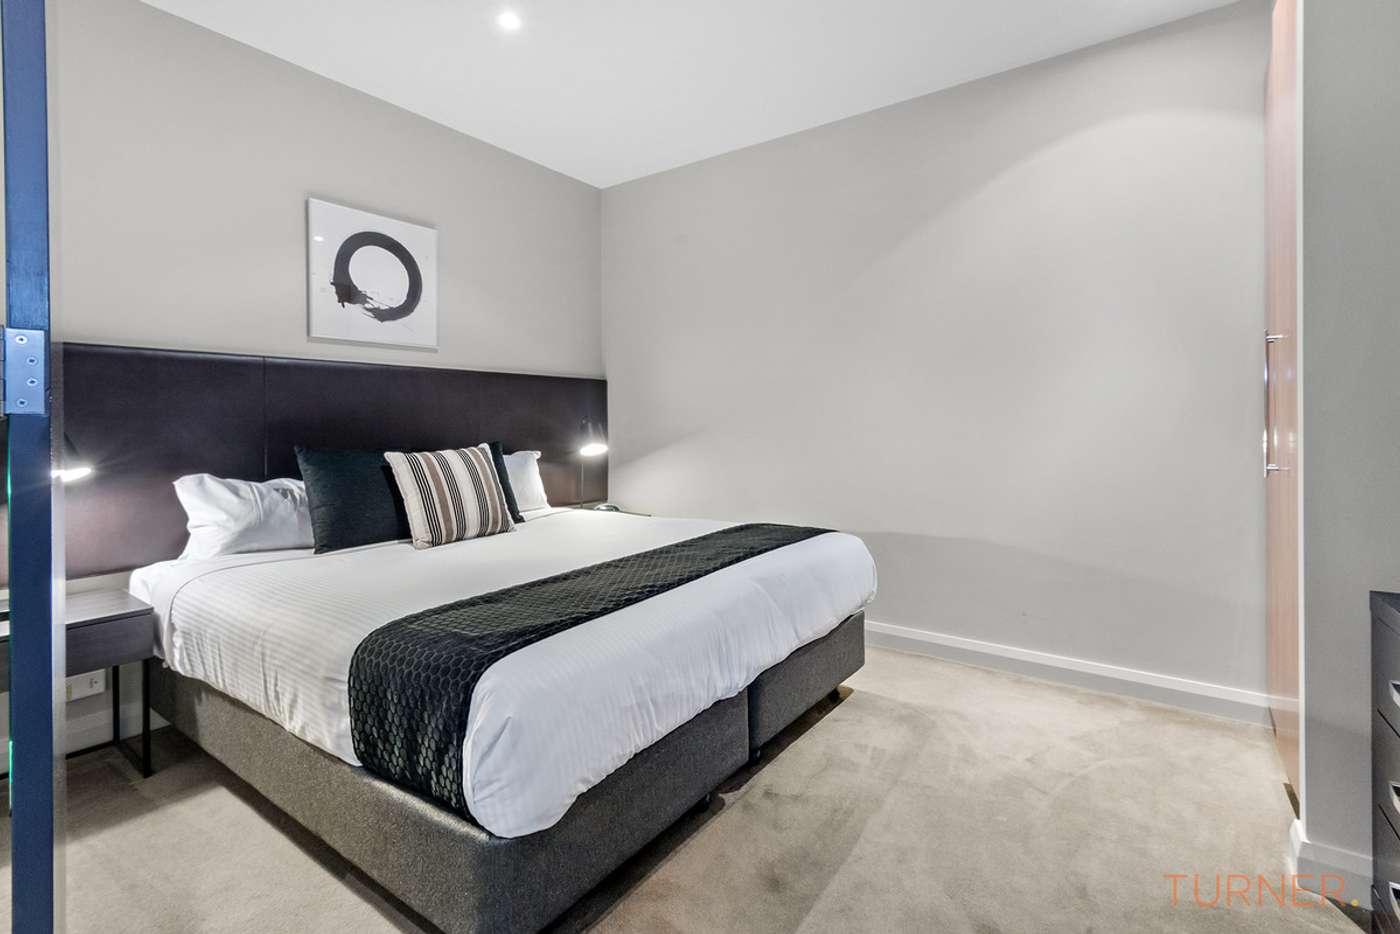 Sixth view of Homely apartment listing, 410/61 Hindmarsh Square, Adelaide SA 5000